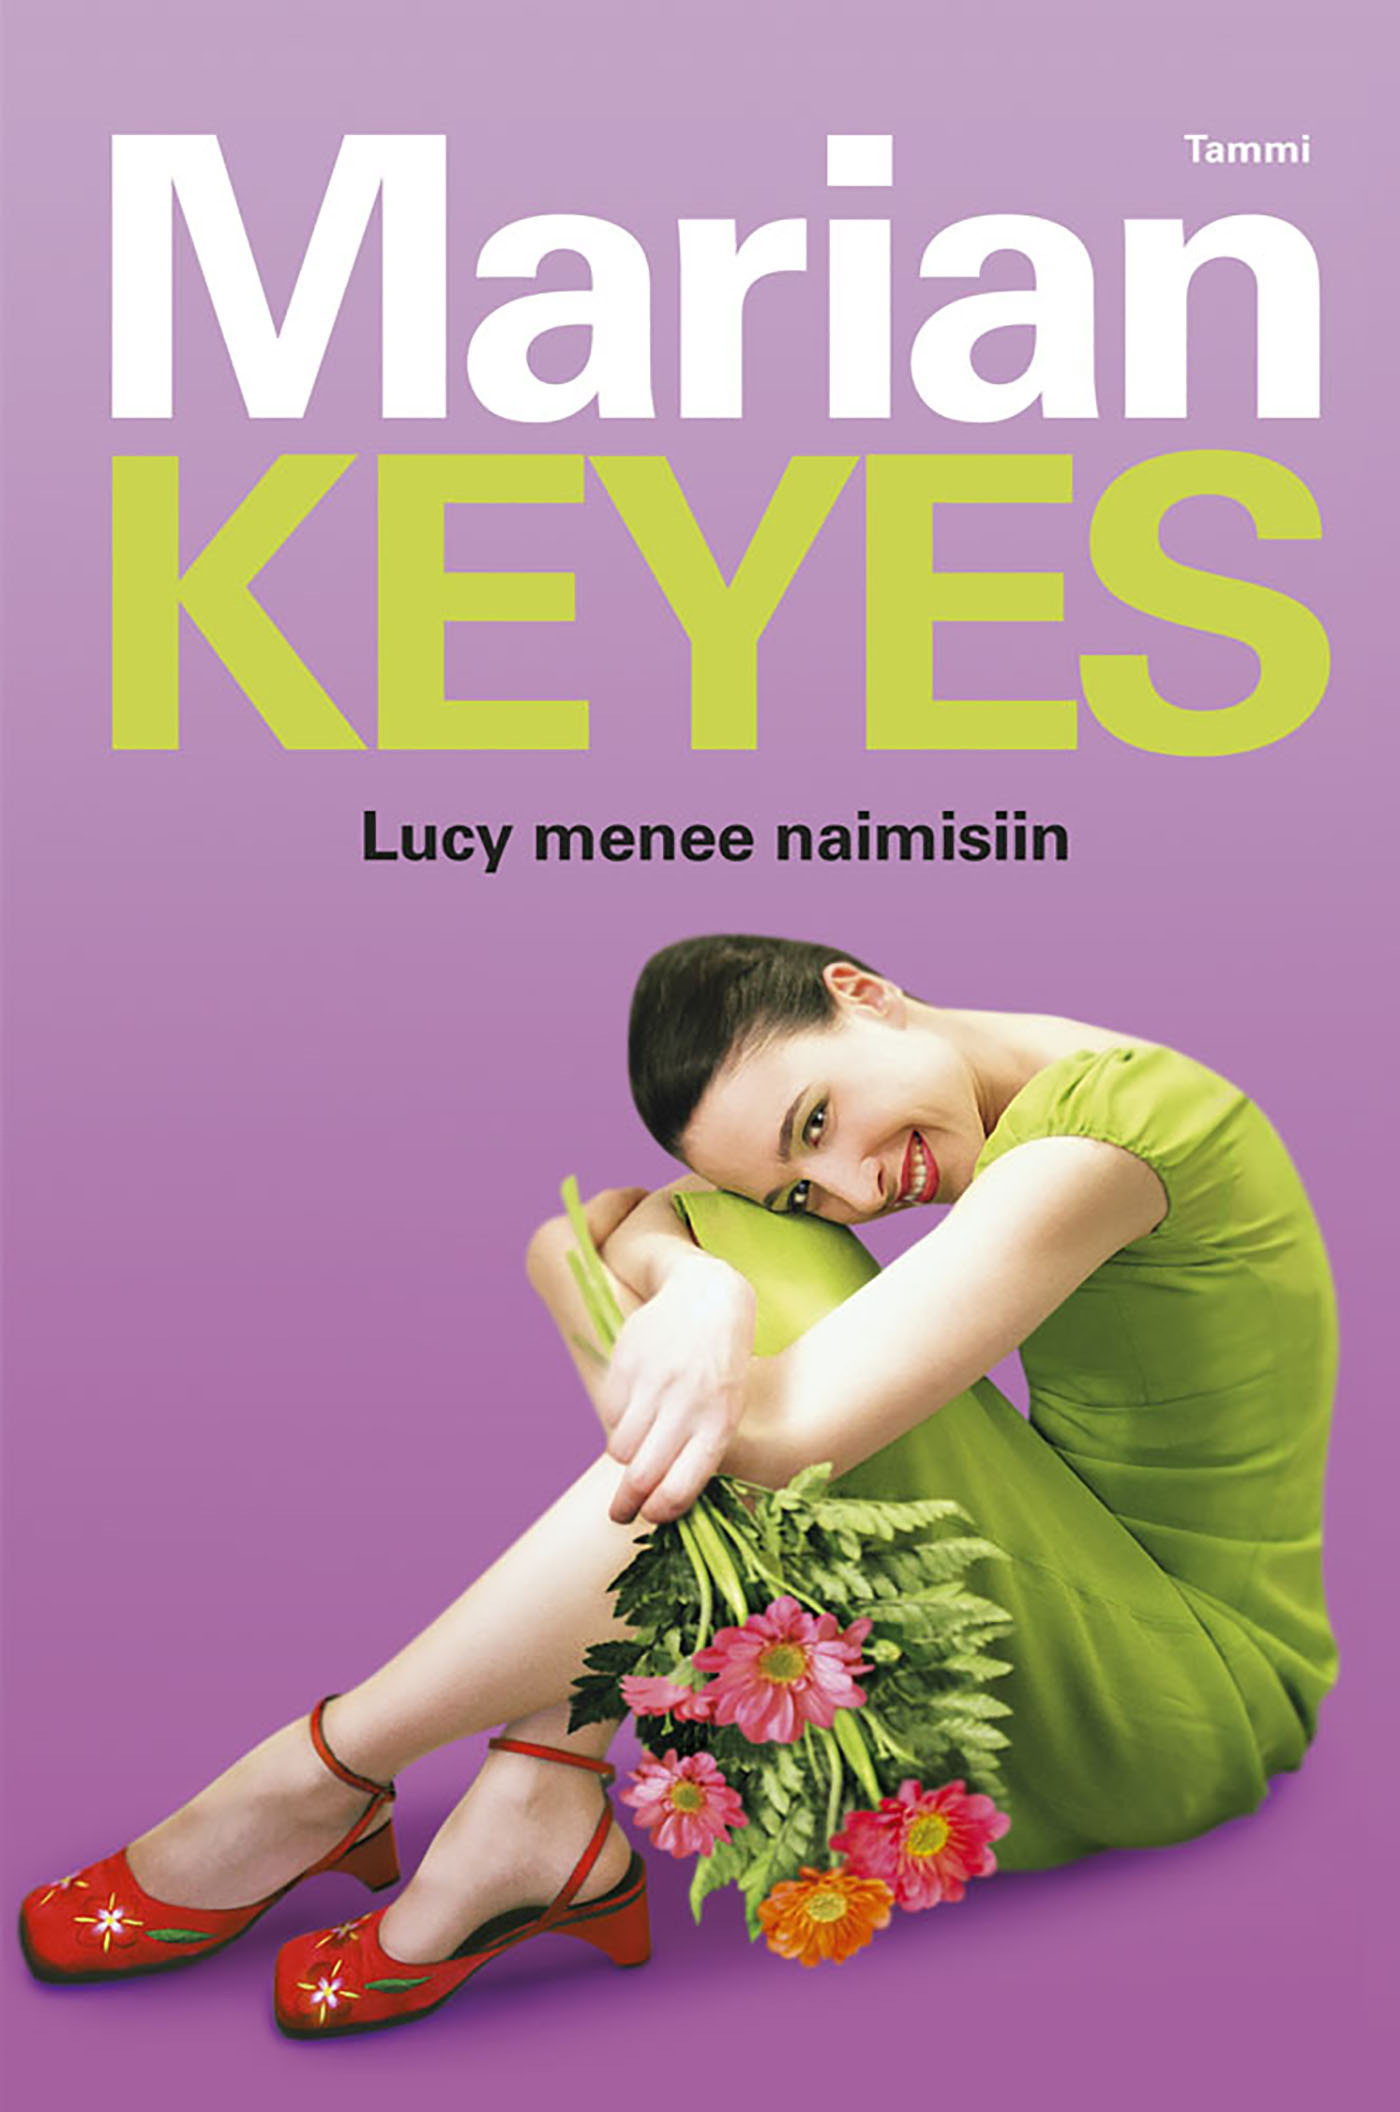 Keyes, Marian - Lucy menee naimisiin, e-kirja